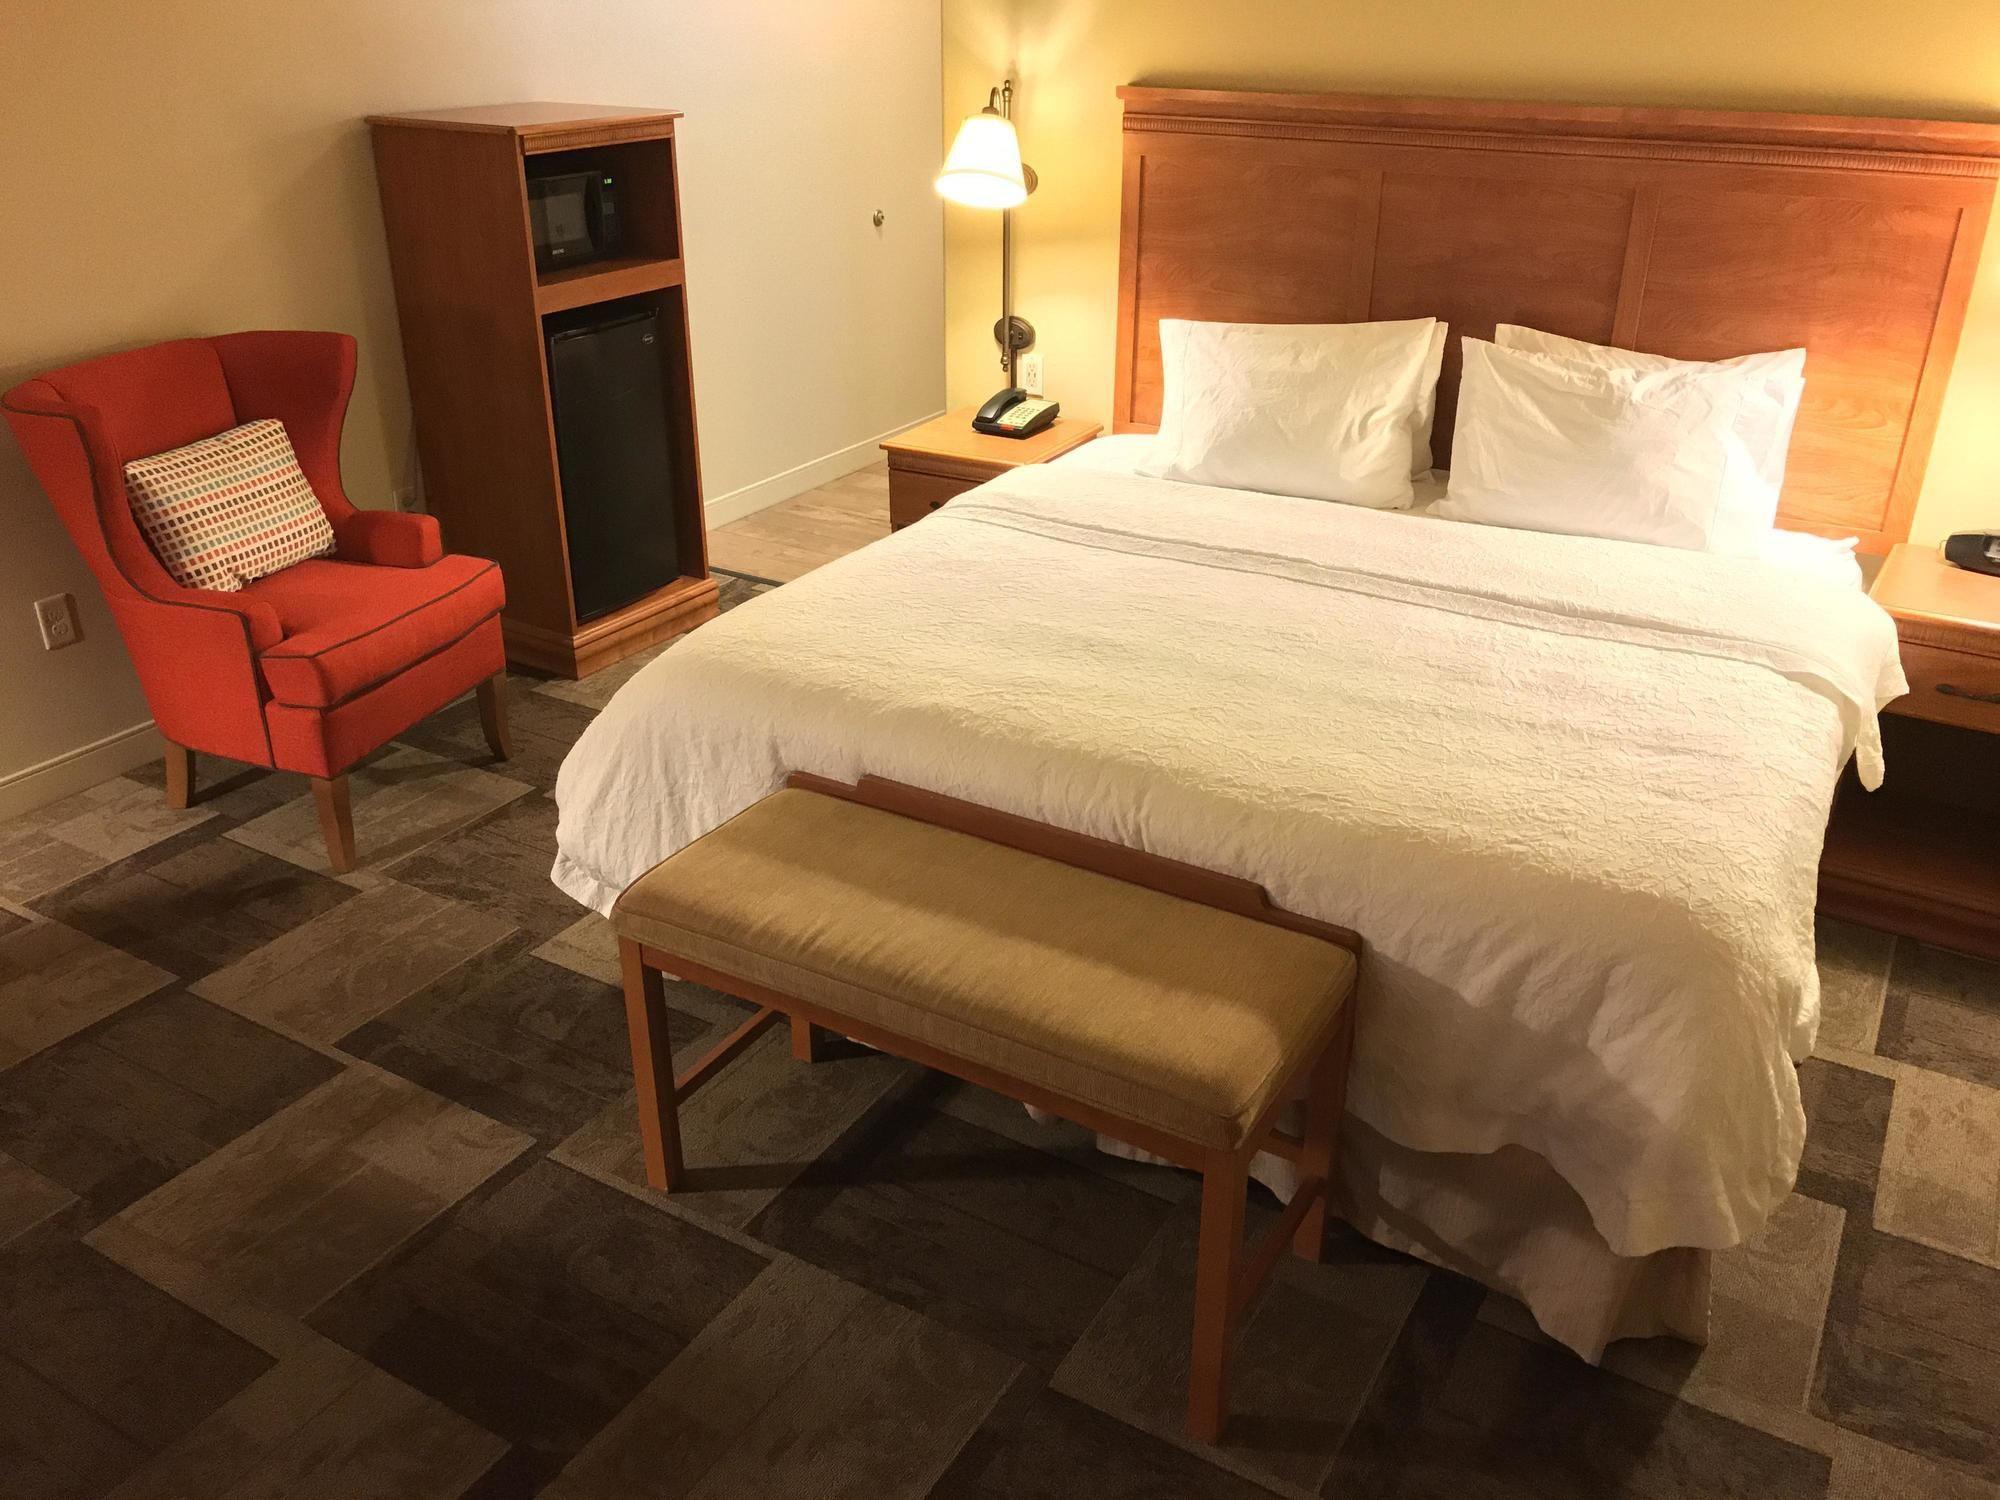 Garden City Hotel Coupons for Garden City, Kansas - FreeHotelCoupons.com